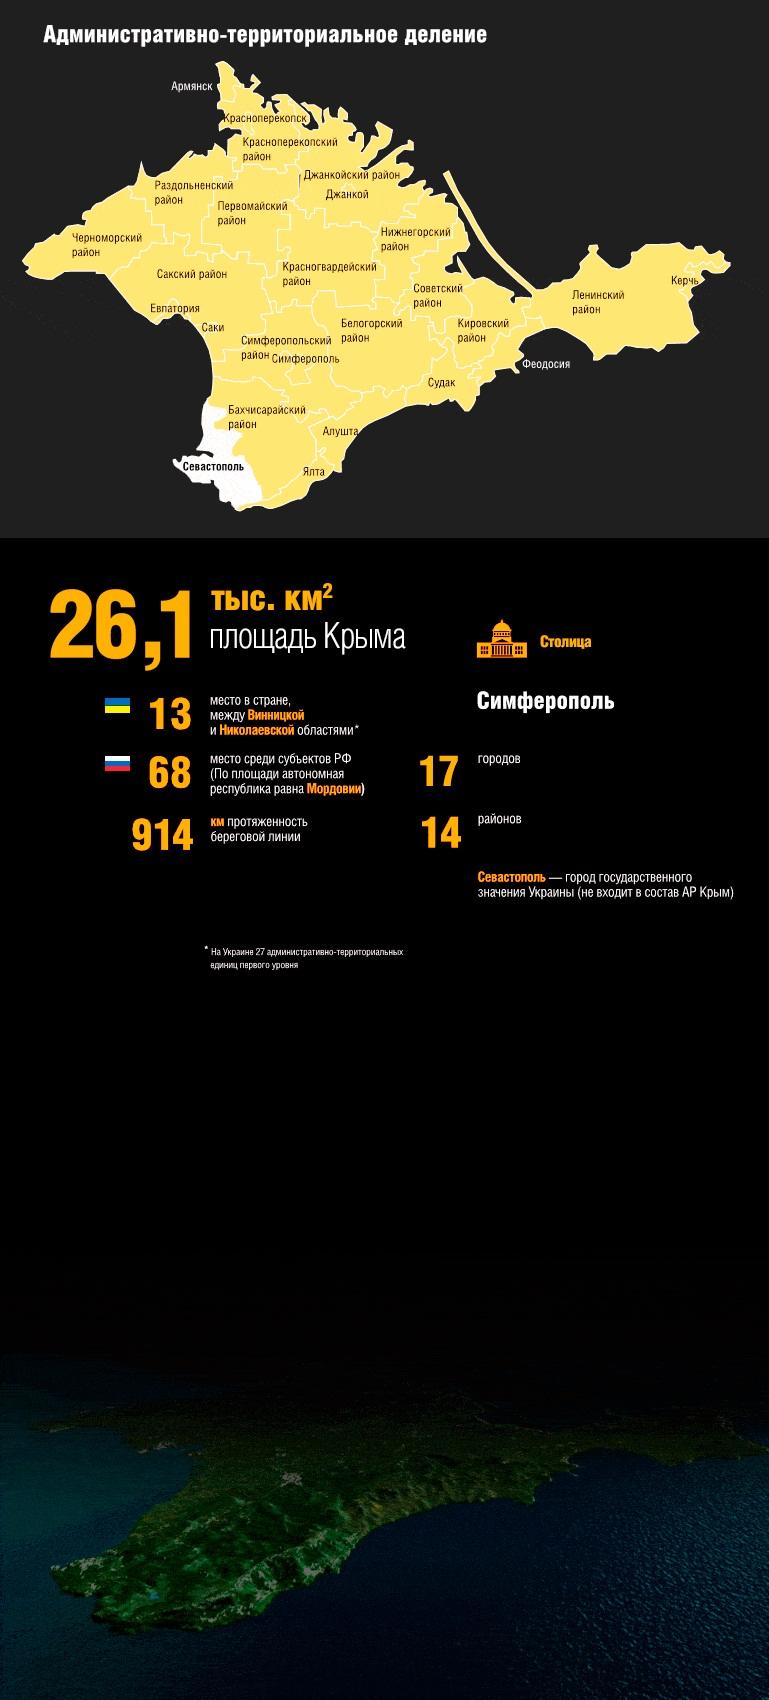 Crimea_map_data_2014_03_17_Kommersant_1_administrative